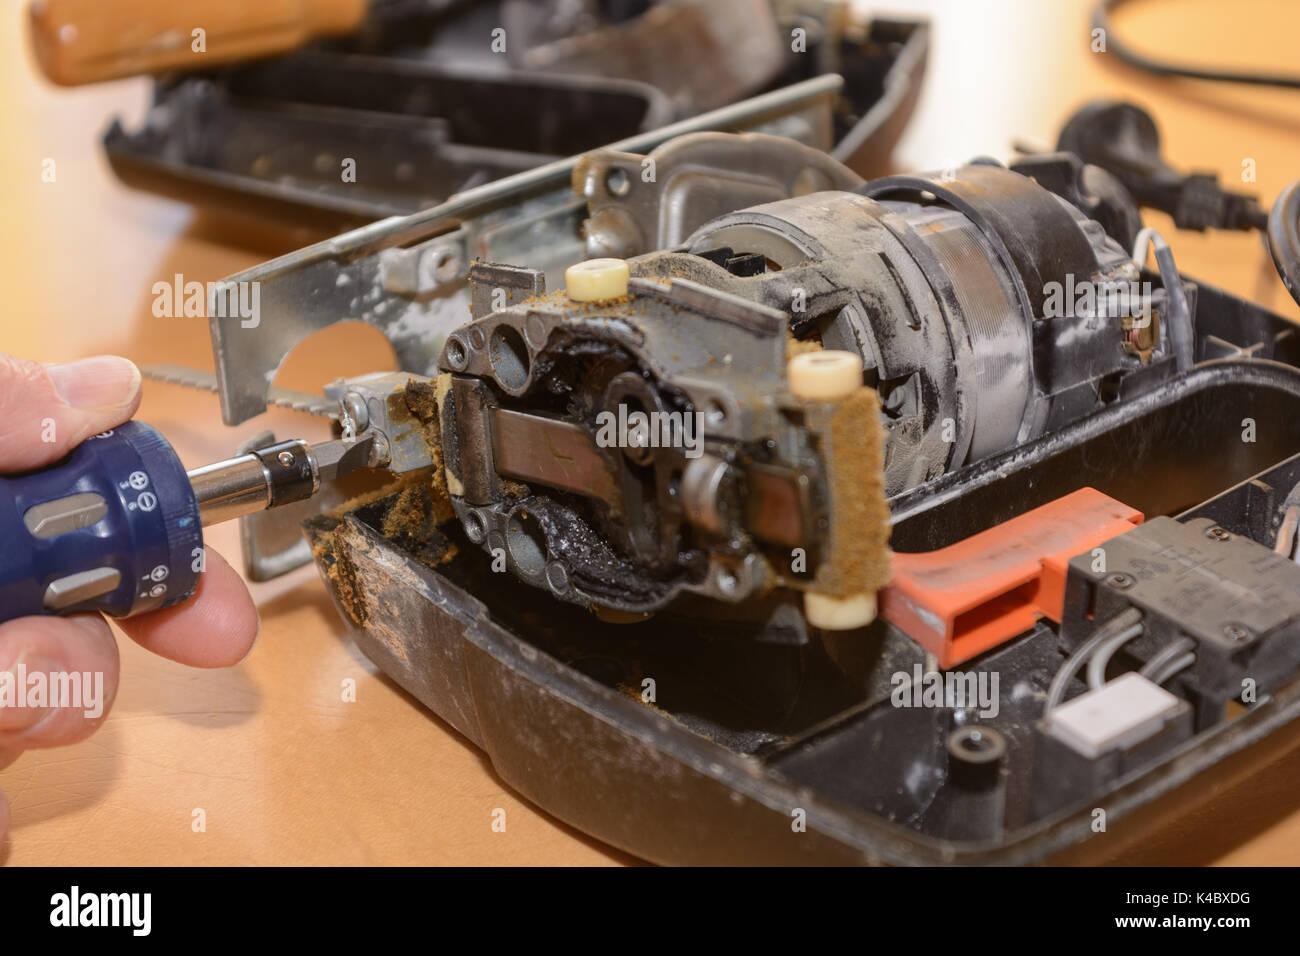 Handyman Repaired Broken Jigsaw With Screwdriver - Stock Image